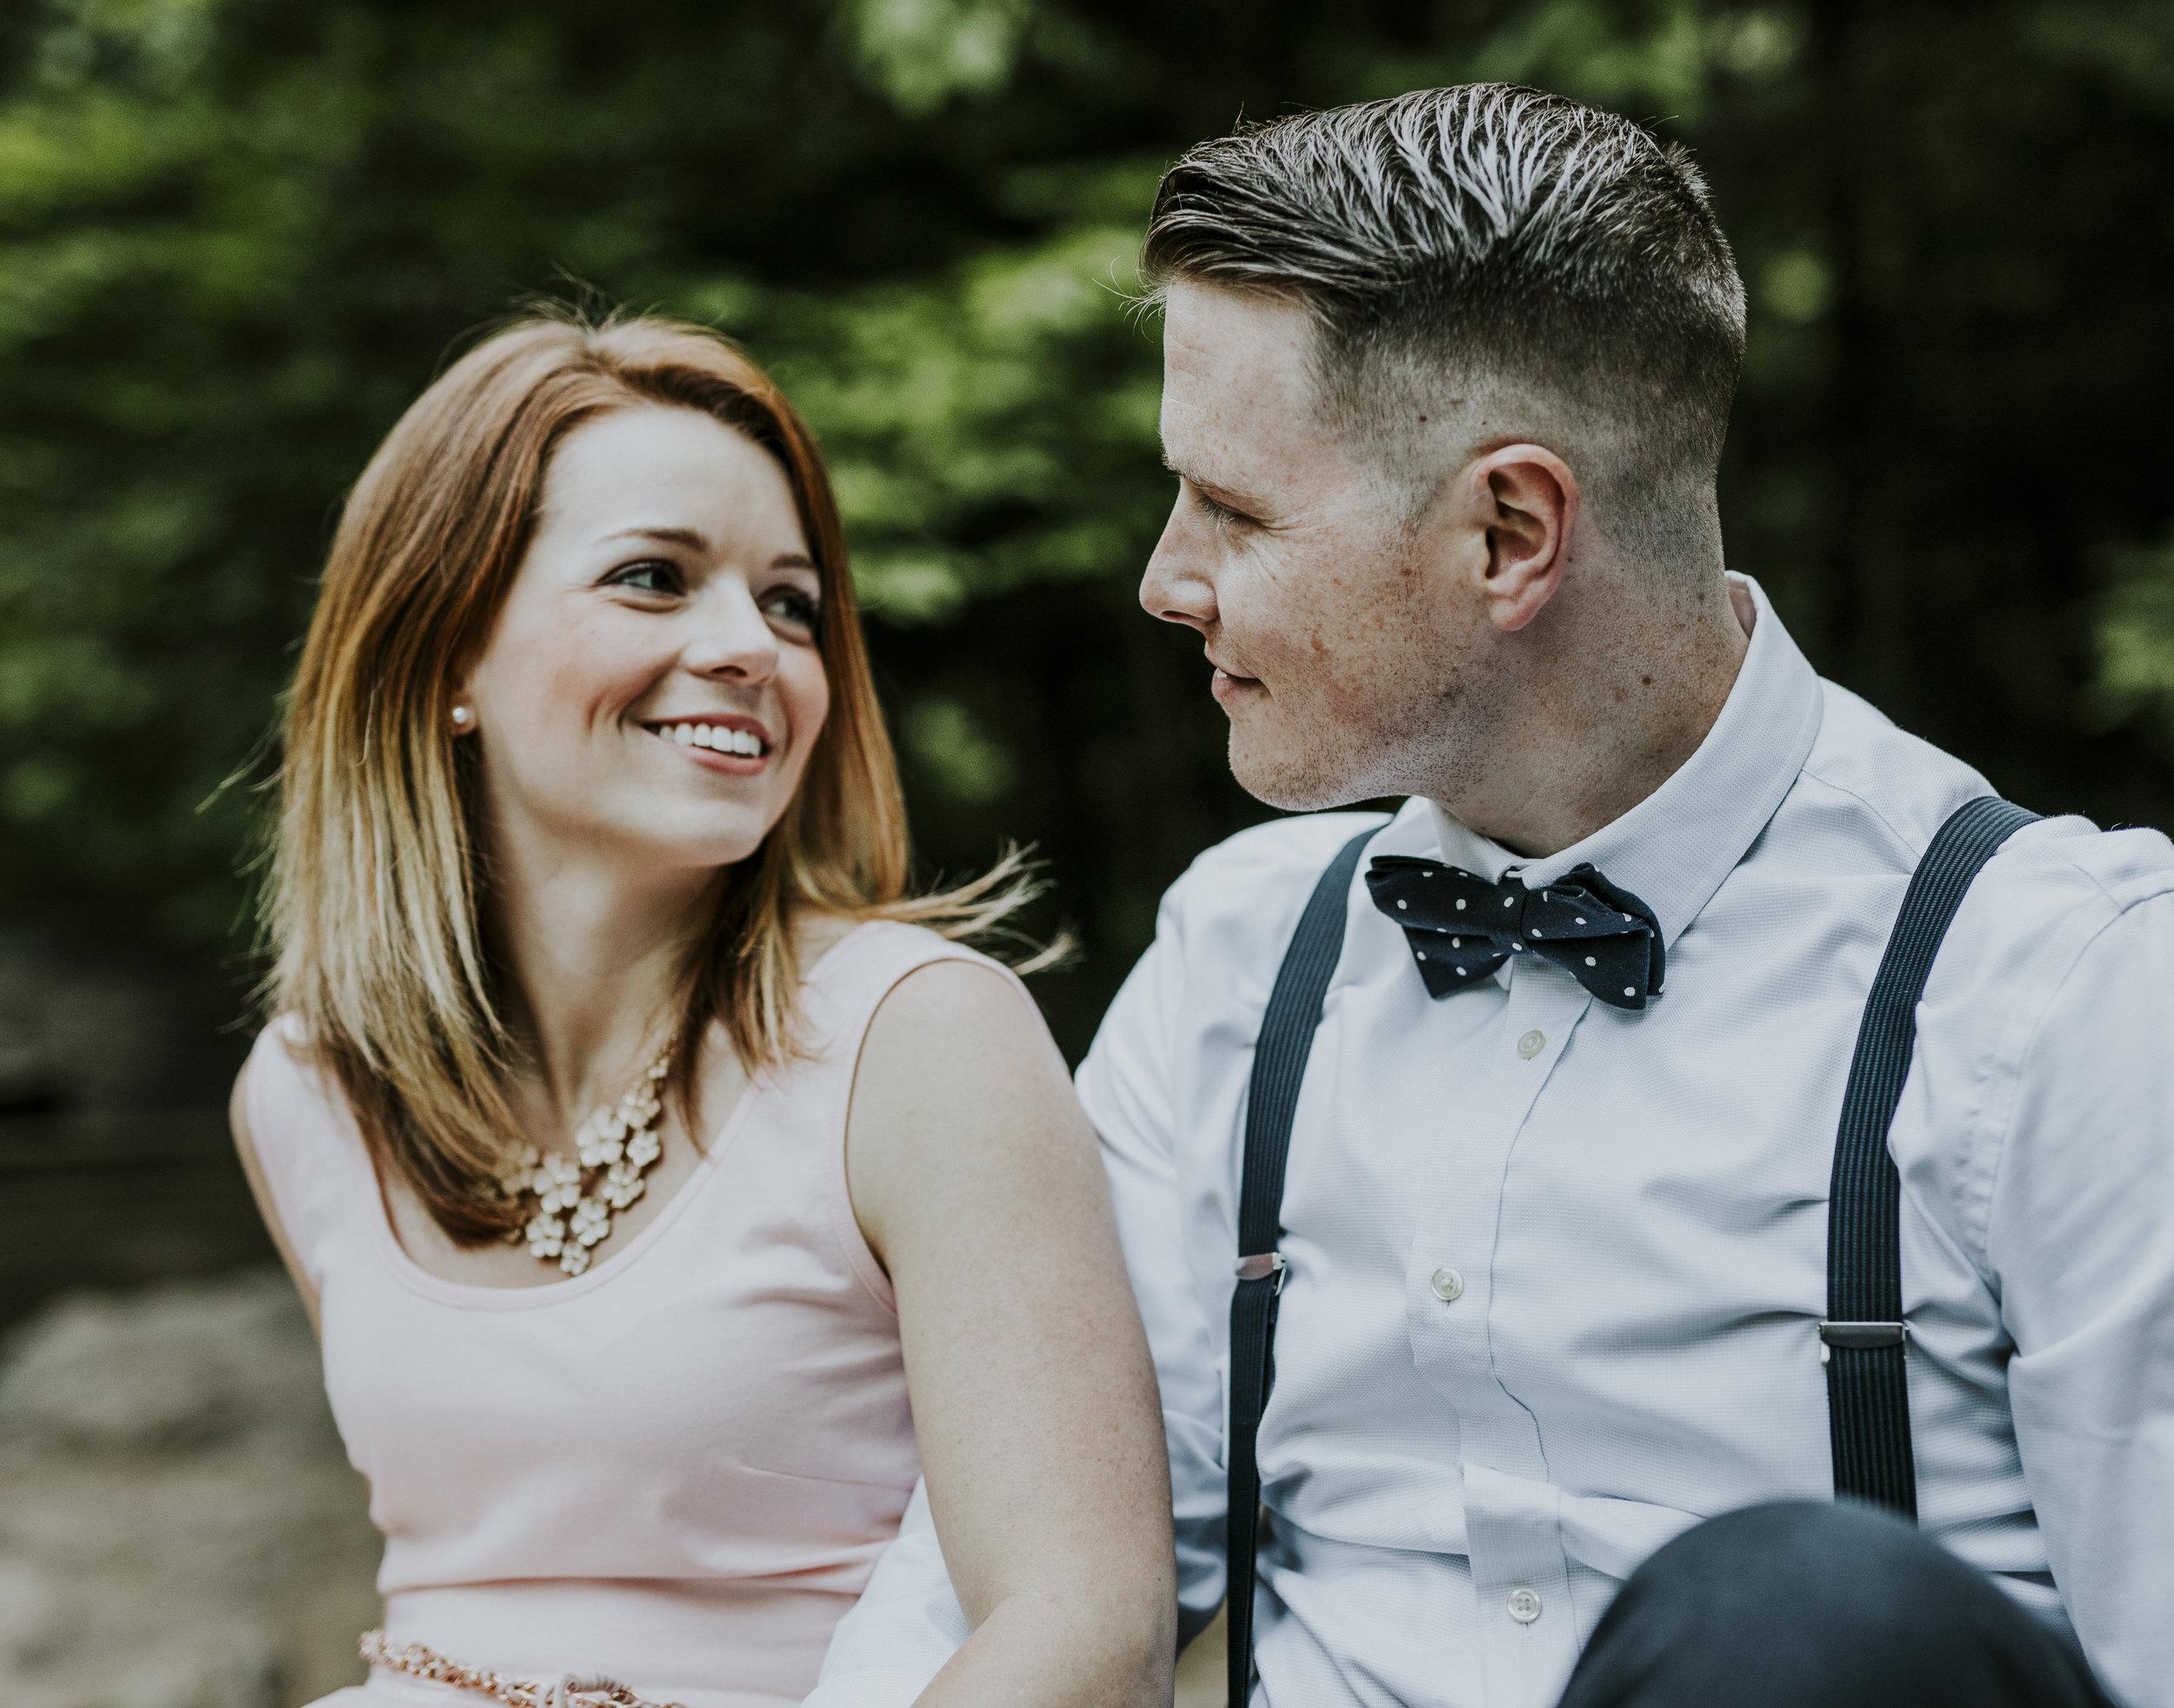 2018-06-10 Lindsey + Joe Engagement-049.jpg